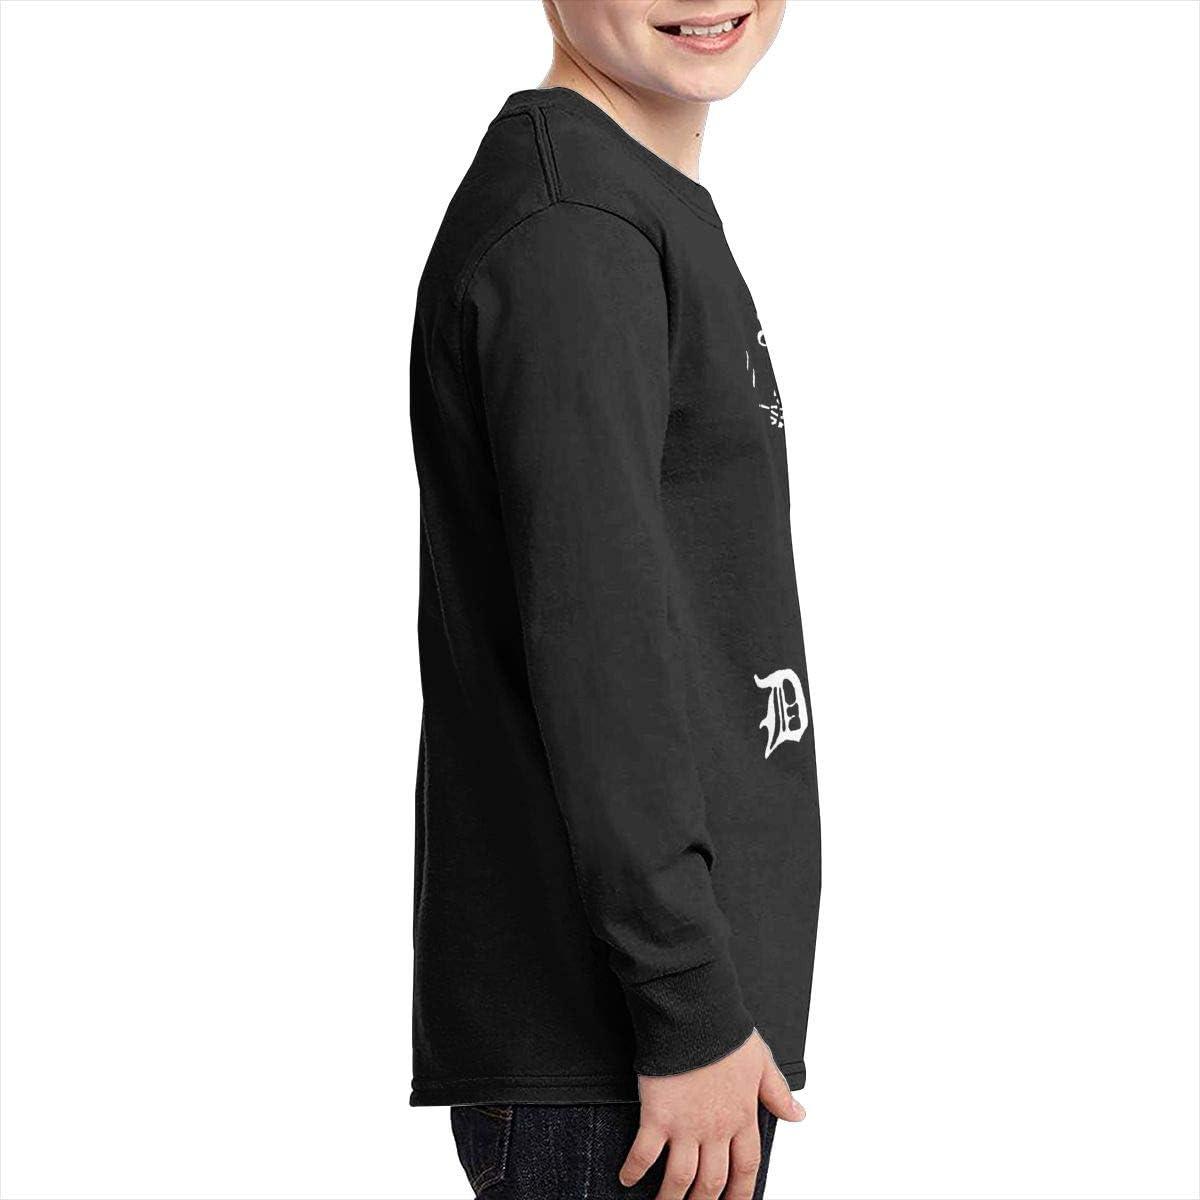 Social Come Distortion Funny Jogging Teen Boy Girl Workout Pullover Sweatshirt Novelty Shirt